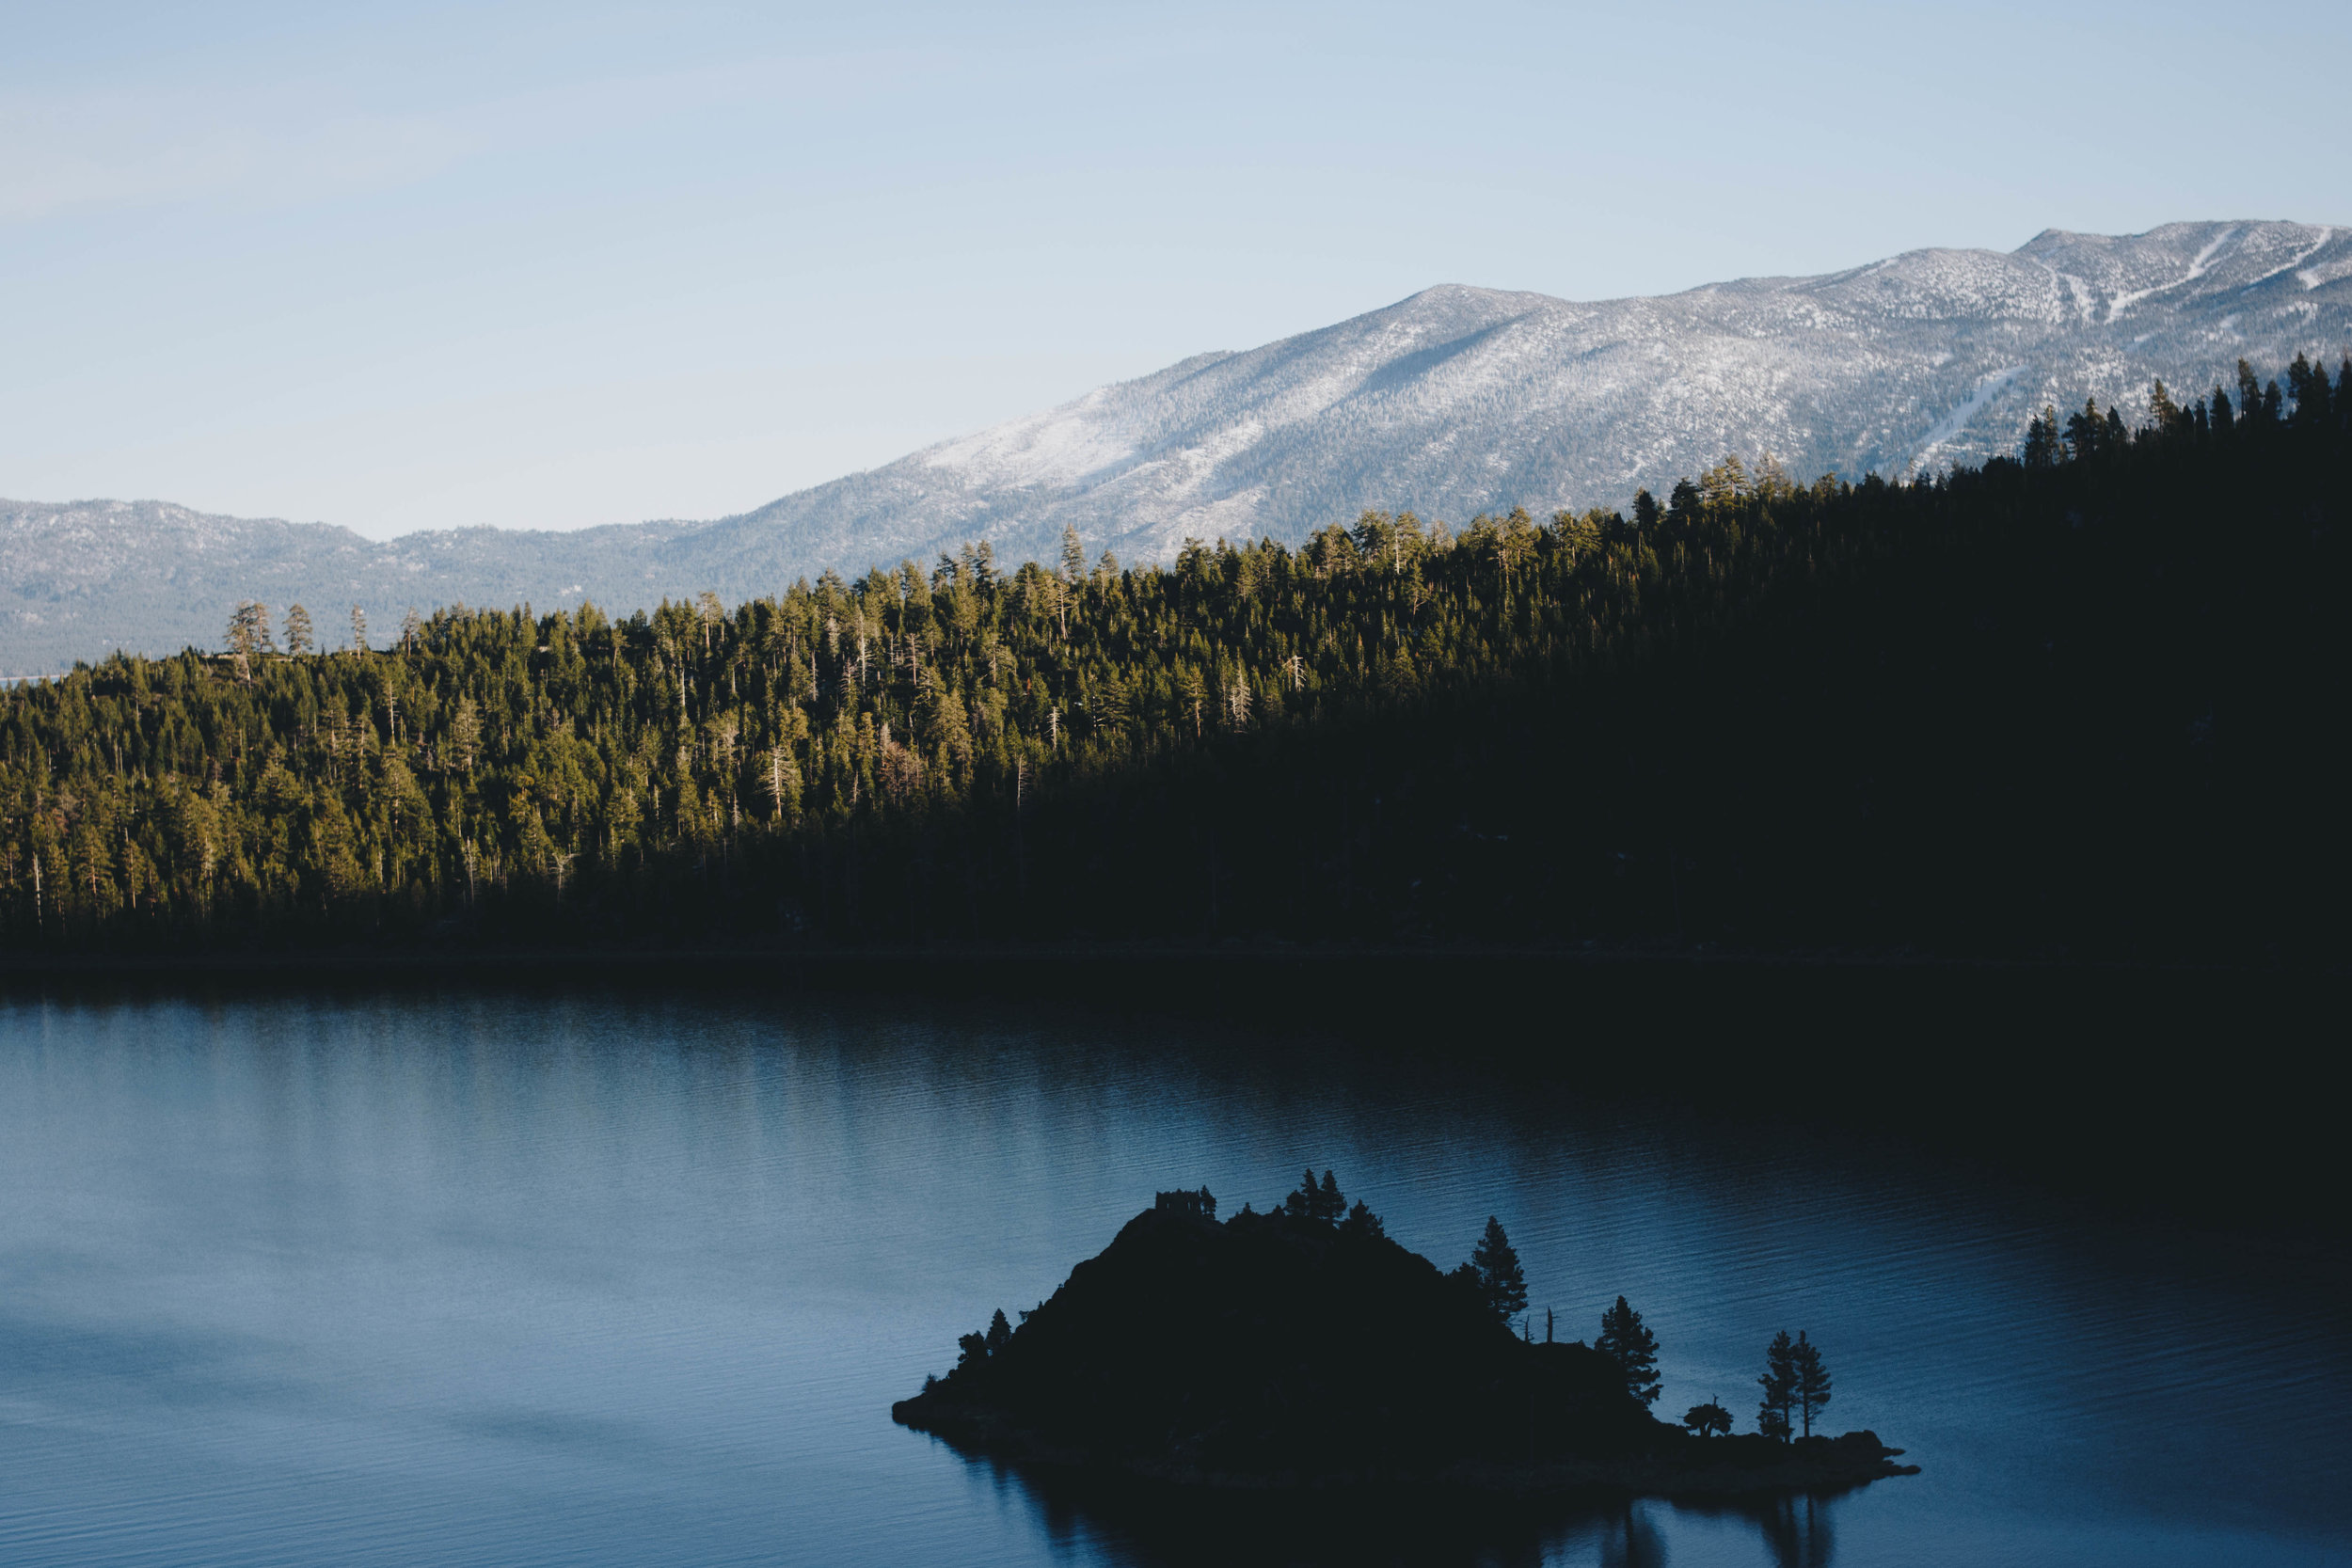 The Isle in Emerald Bay | Lake Tahoe | December 18, 2016